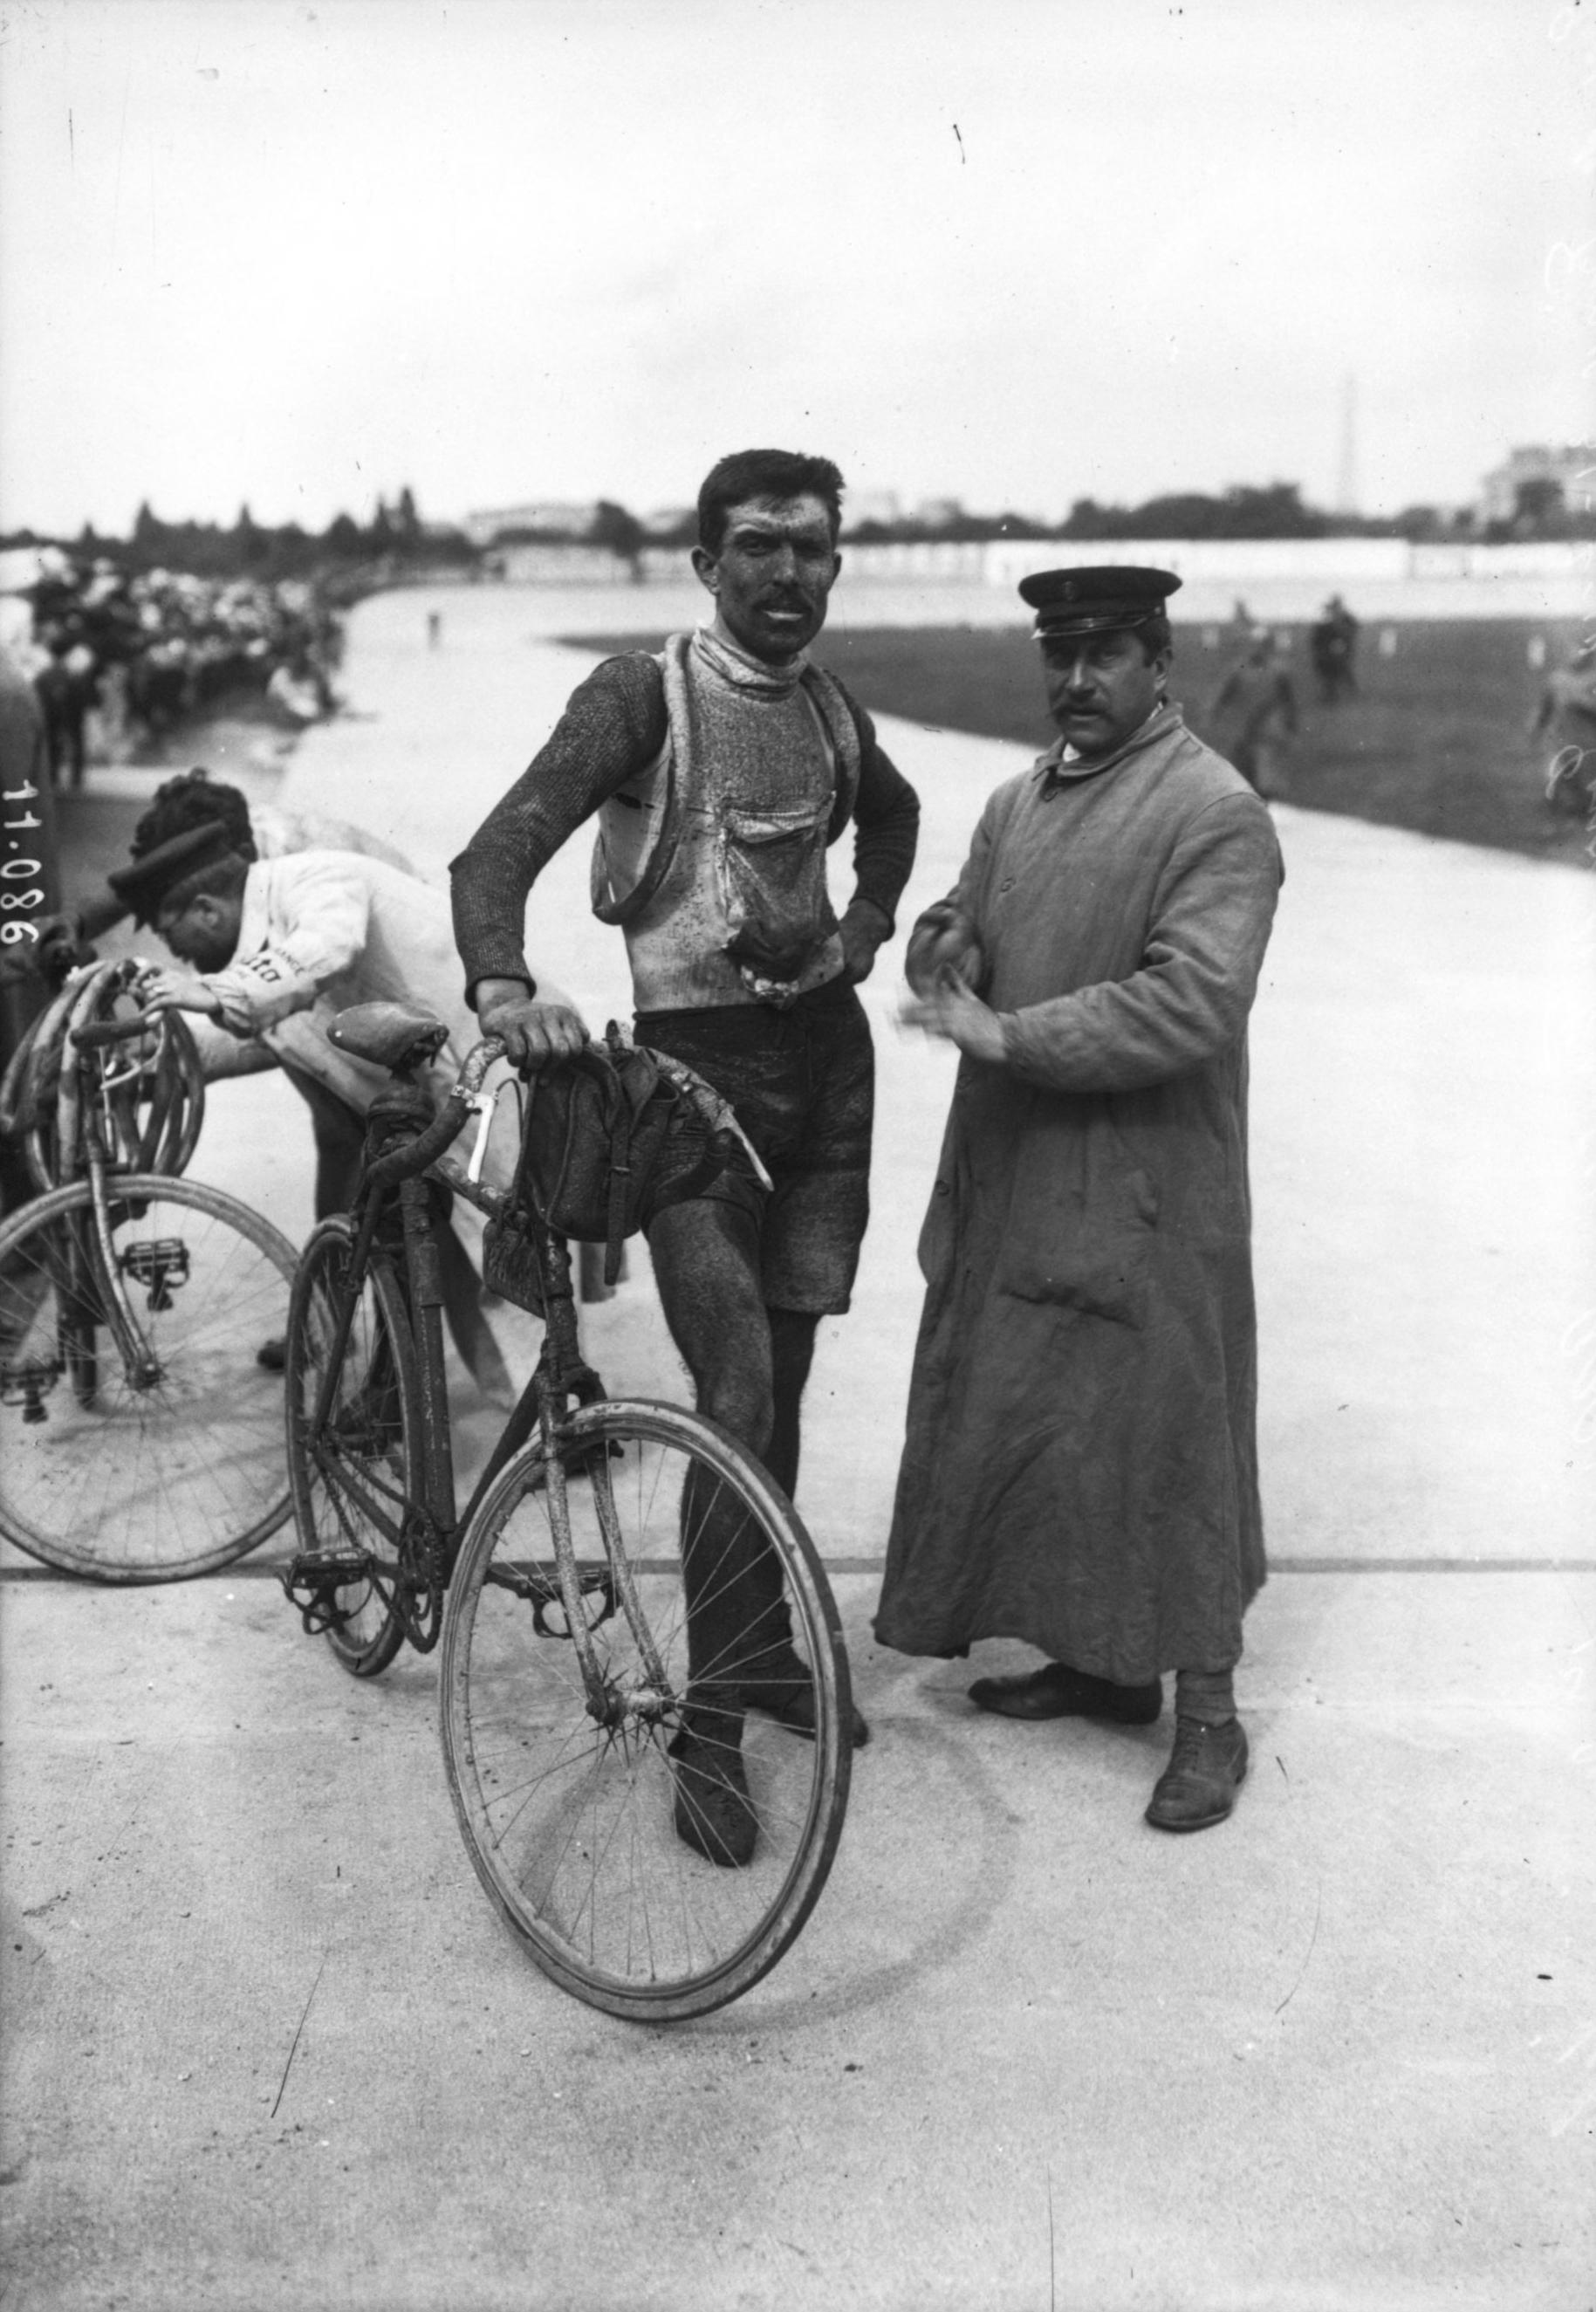 Ernesto Azzini en su triunfo de etapa del Tour de France del 1910